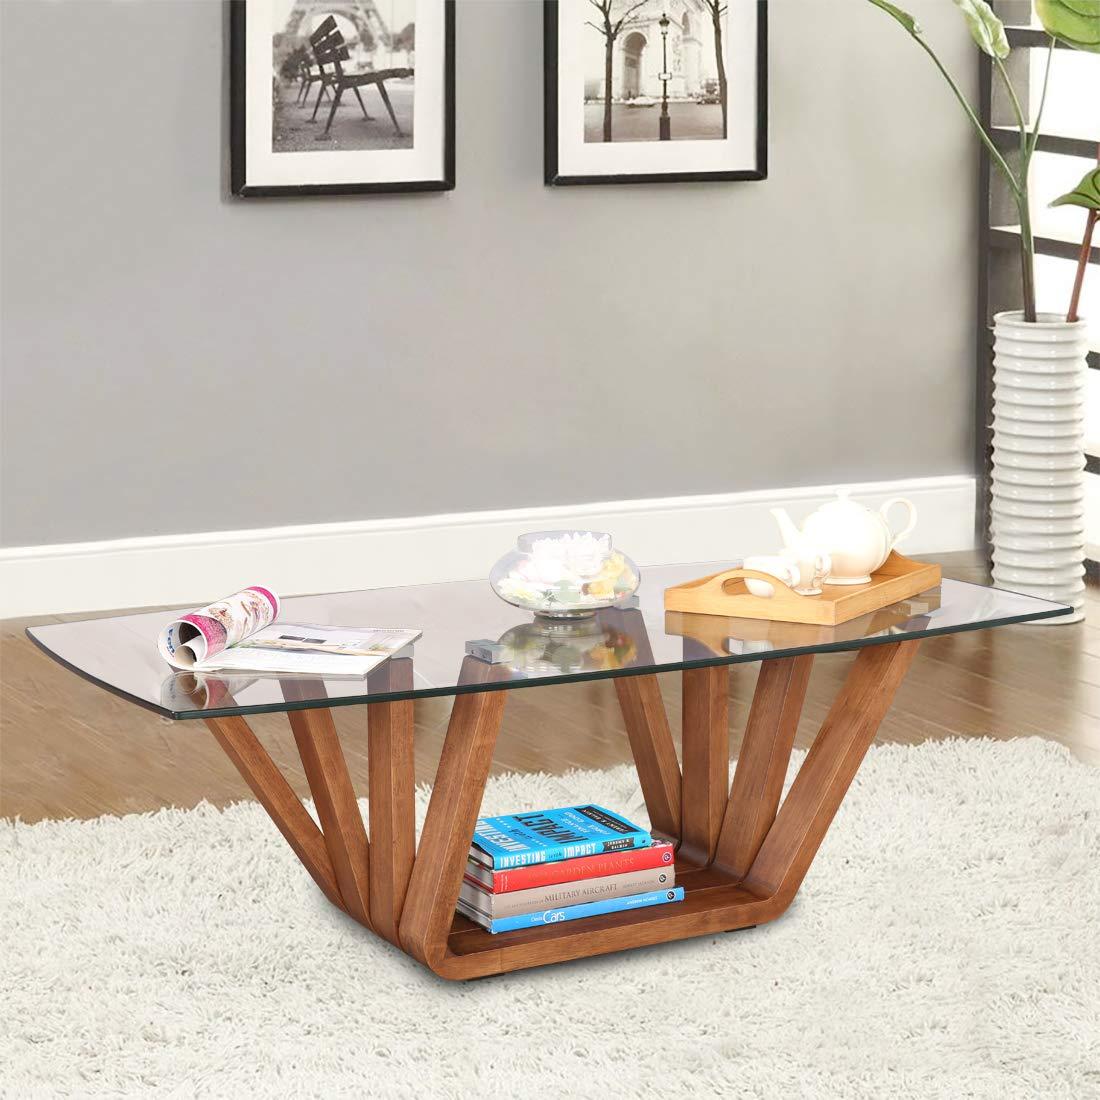 HomeTown Hobart Engineered Wood Glass Top Center Table in Brown ...